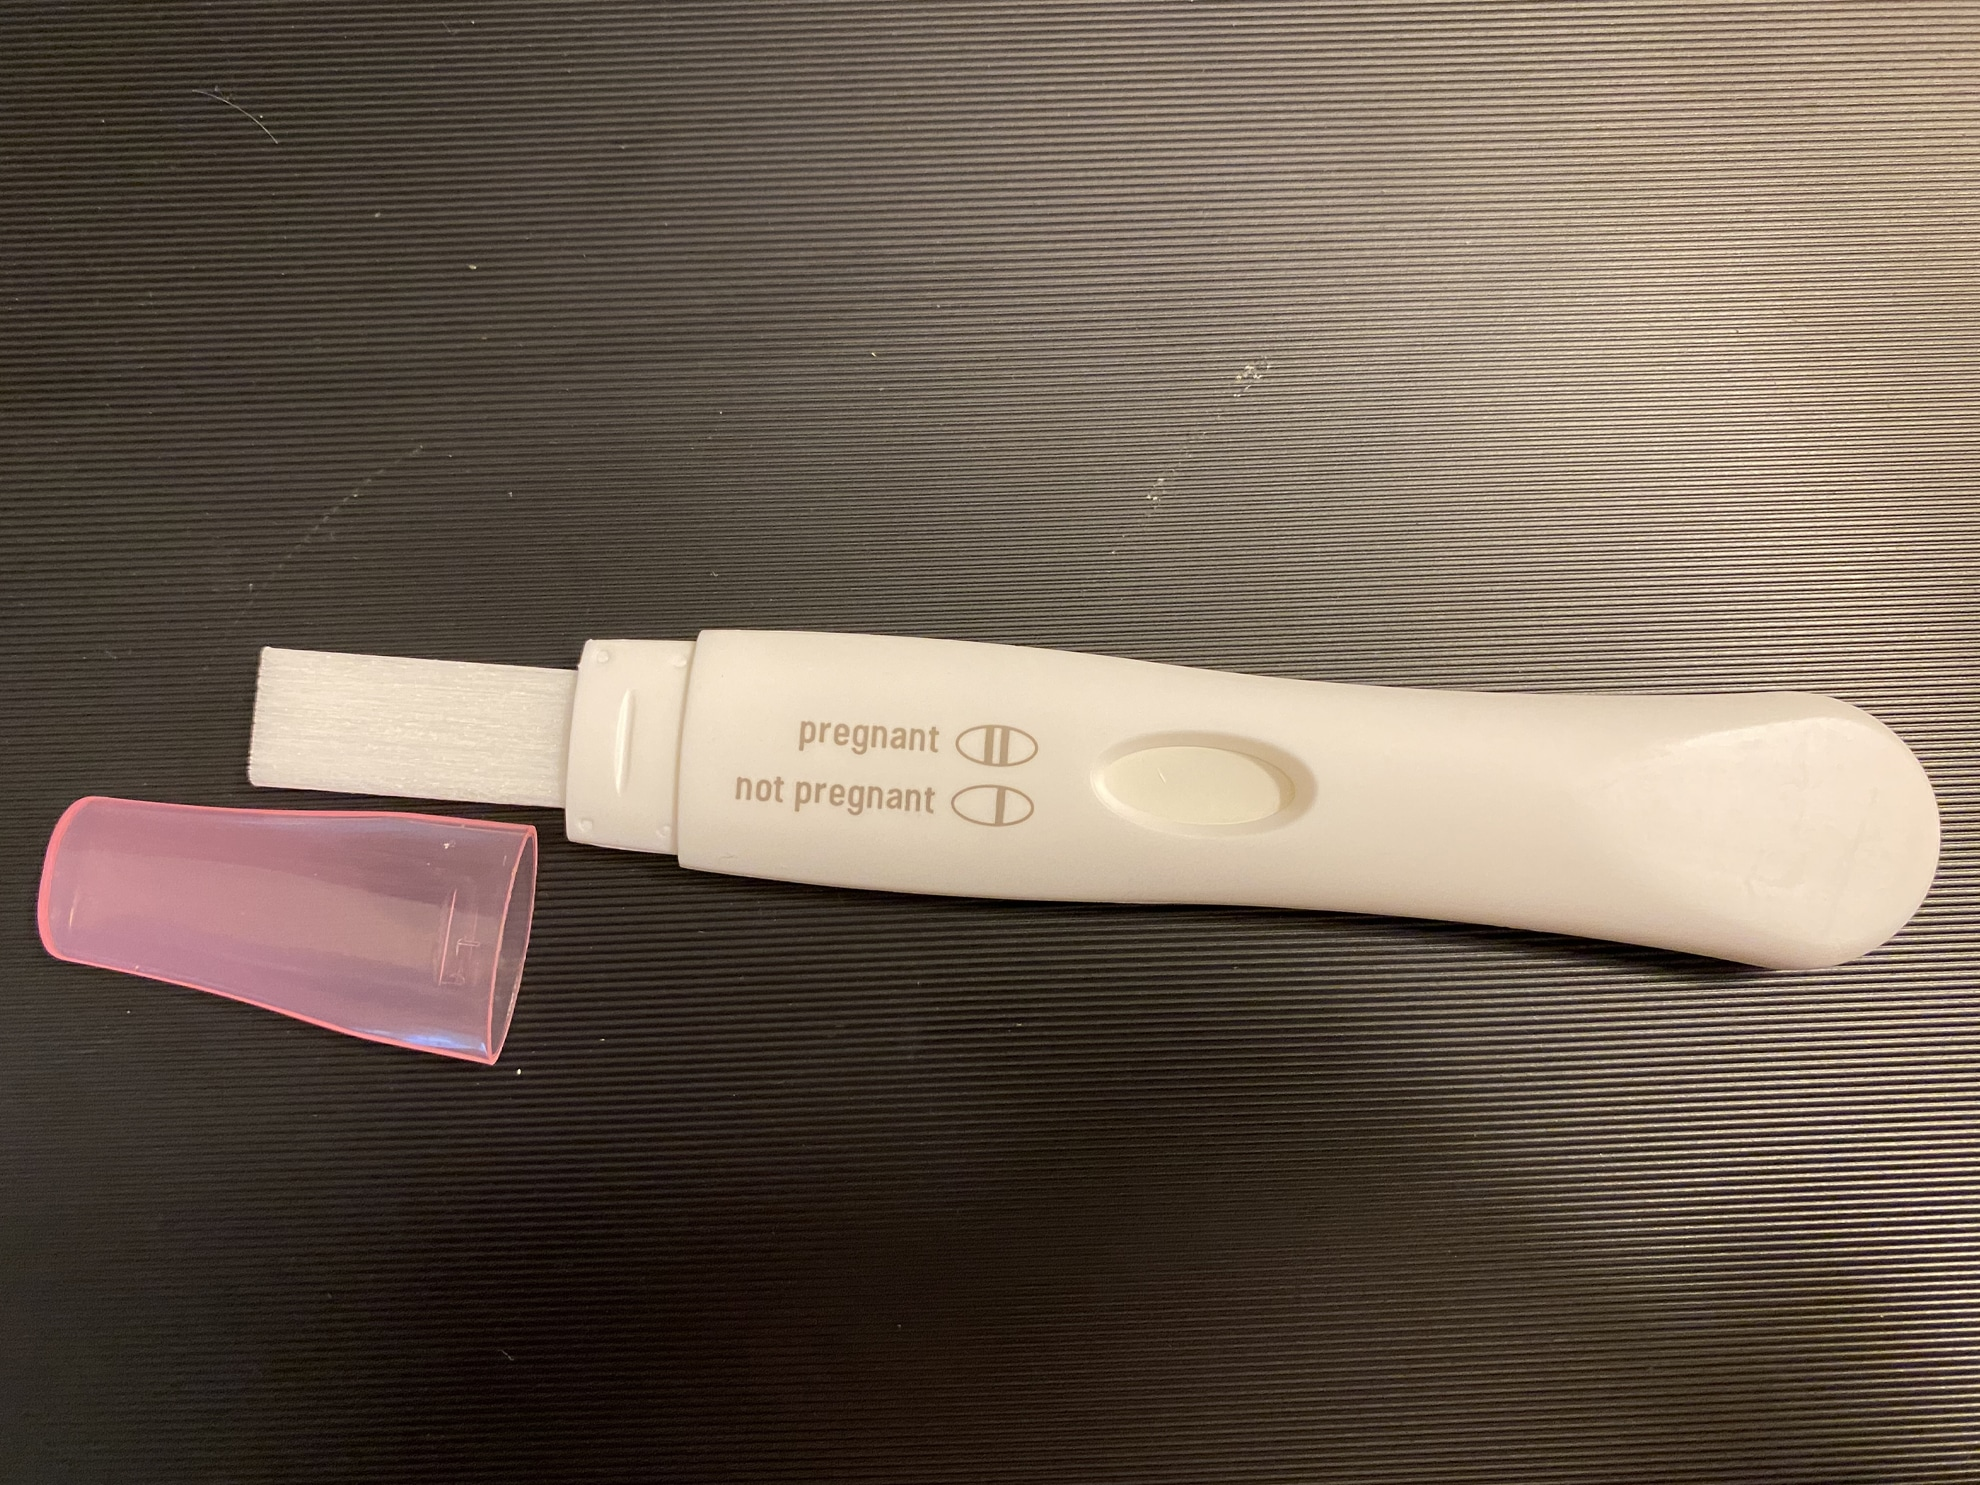 Walgreens One Step Analog Pregnancy Test hCG Sensitivity